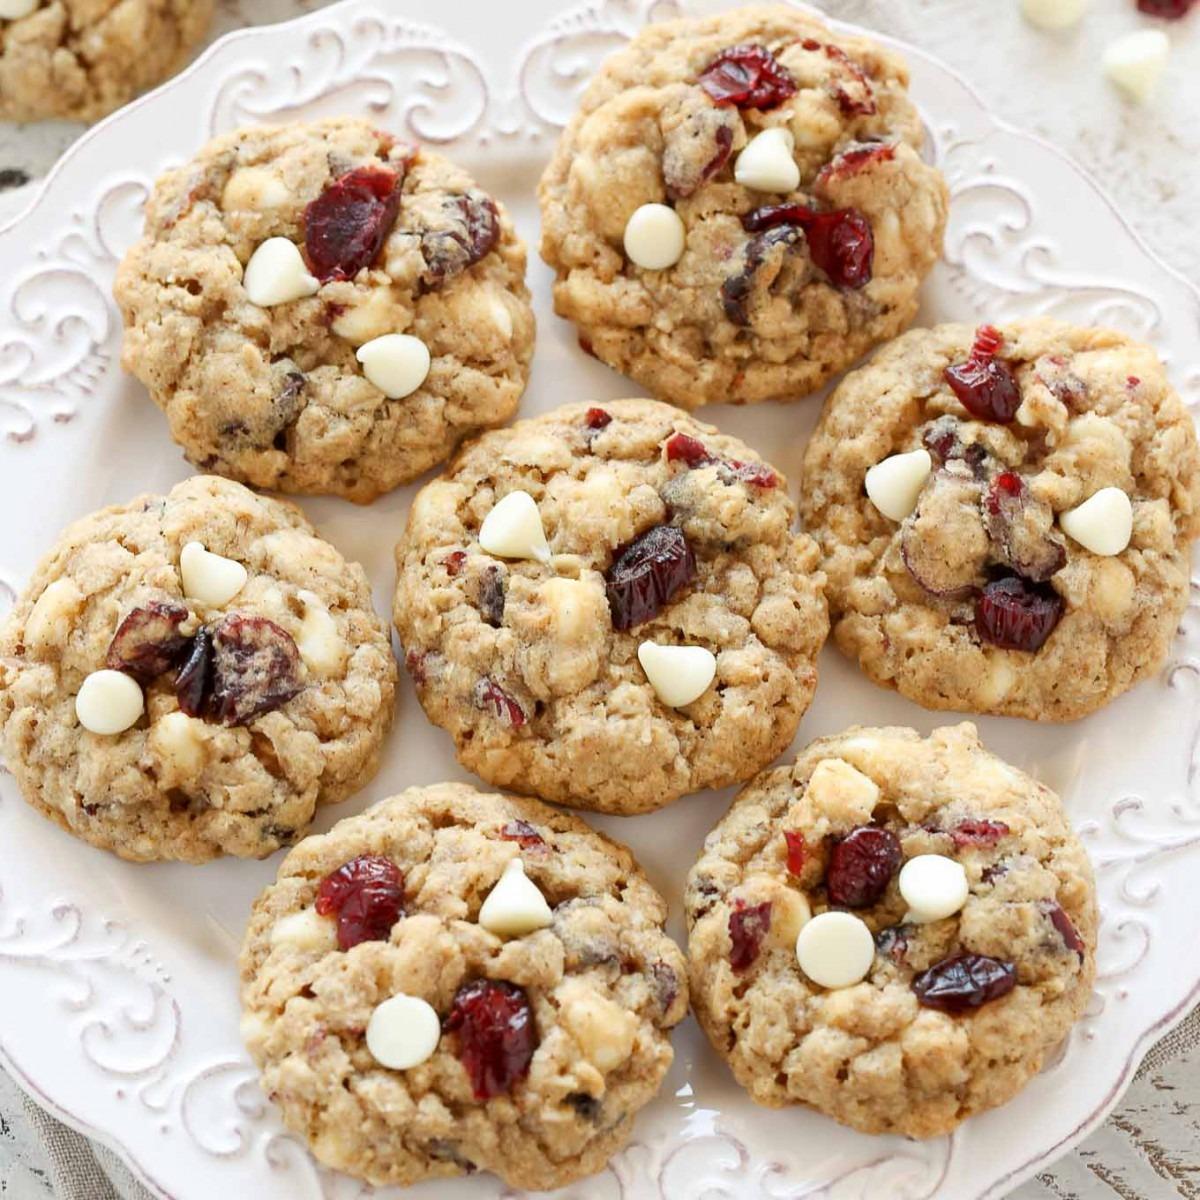 White Chocolate Cranberry Oatmeal Cookies (1 Dozen)